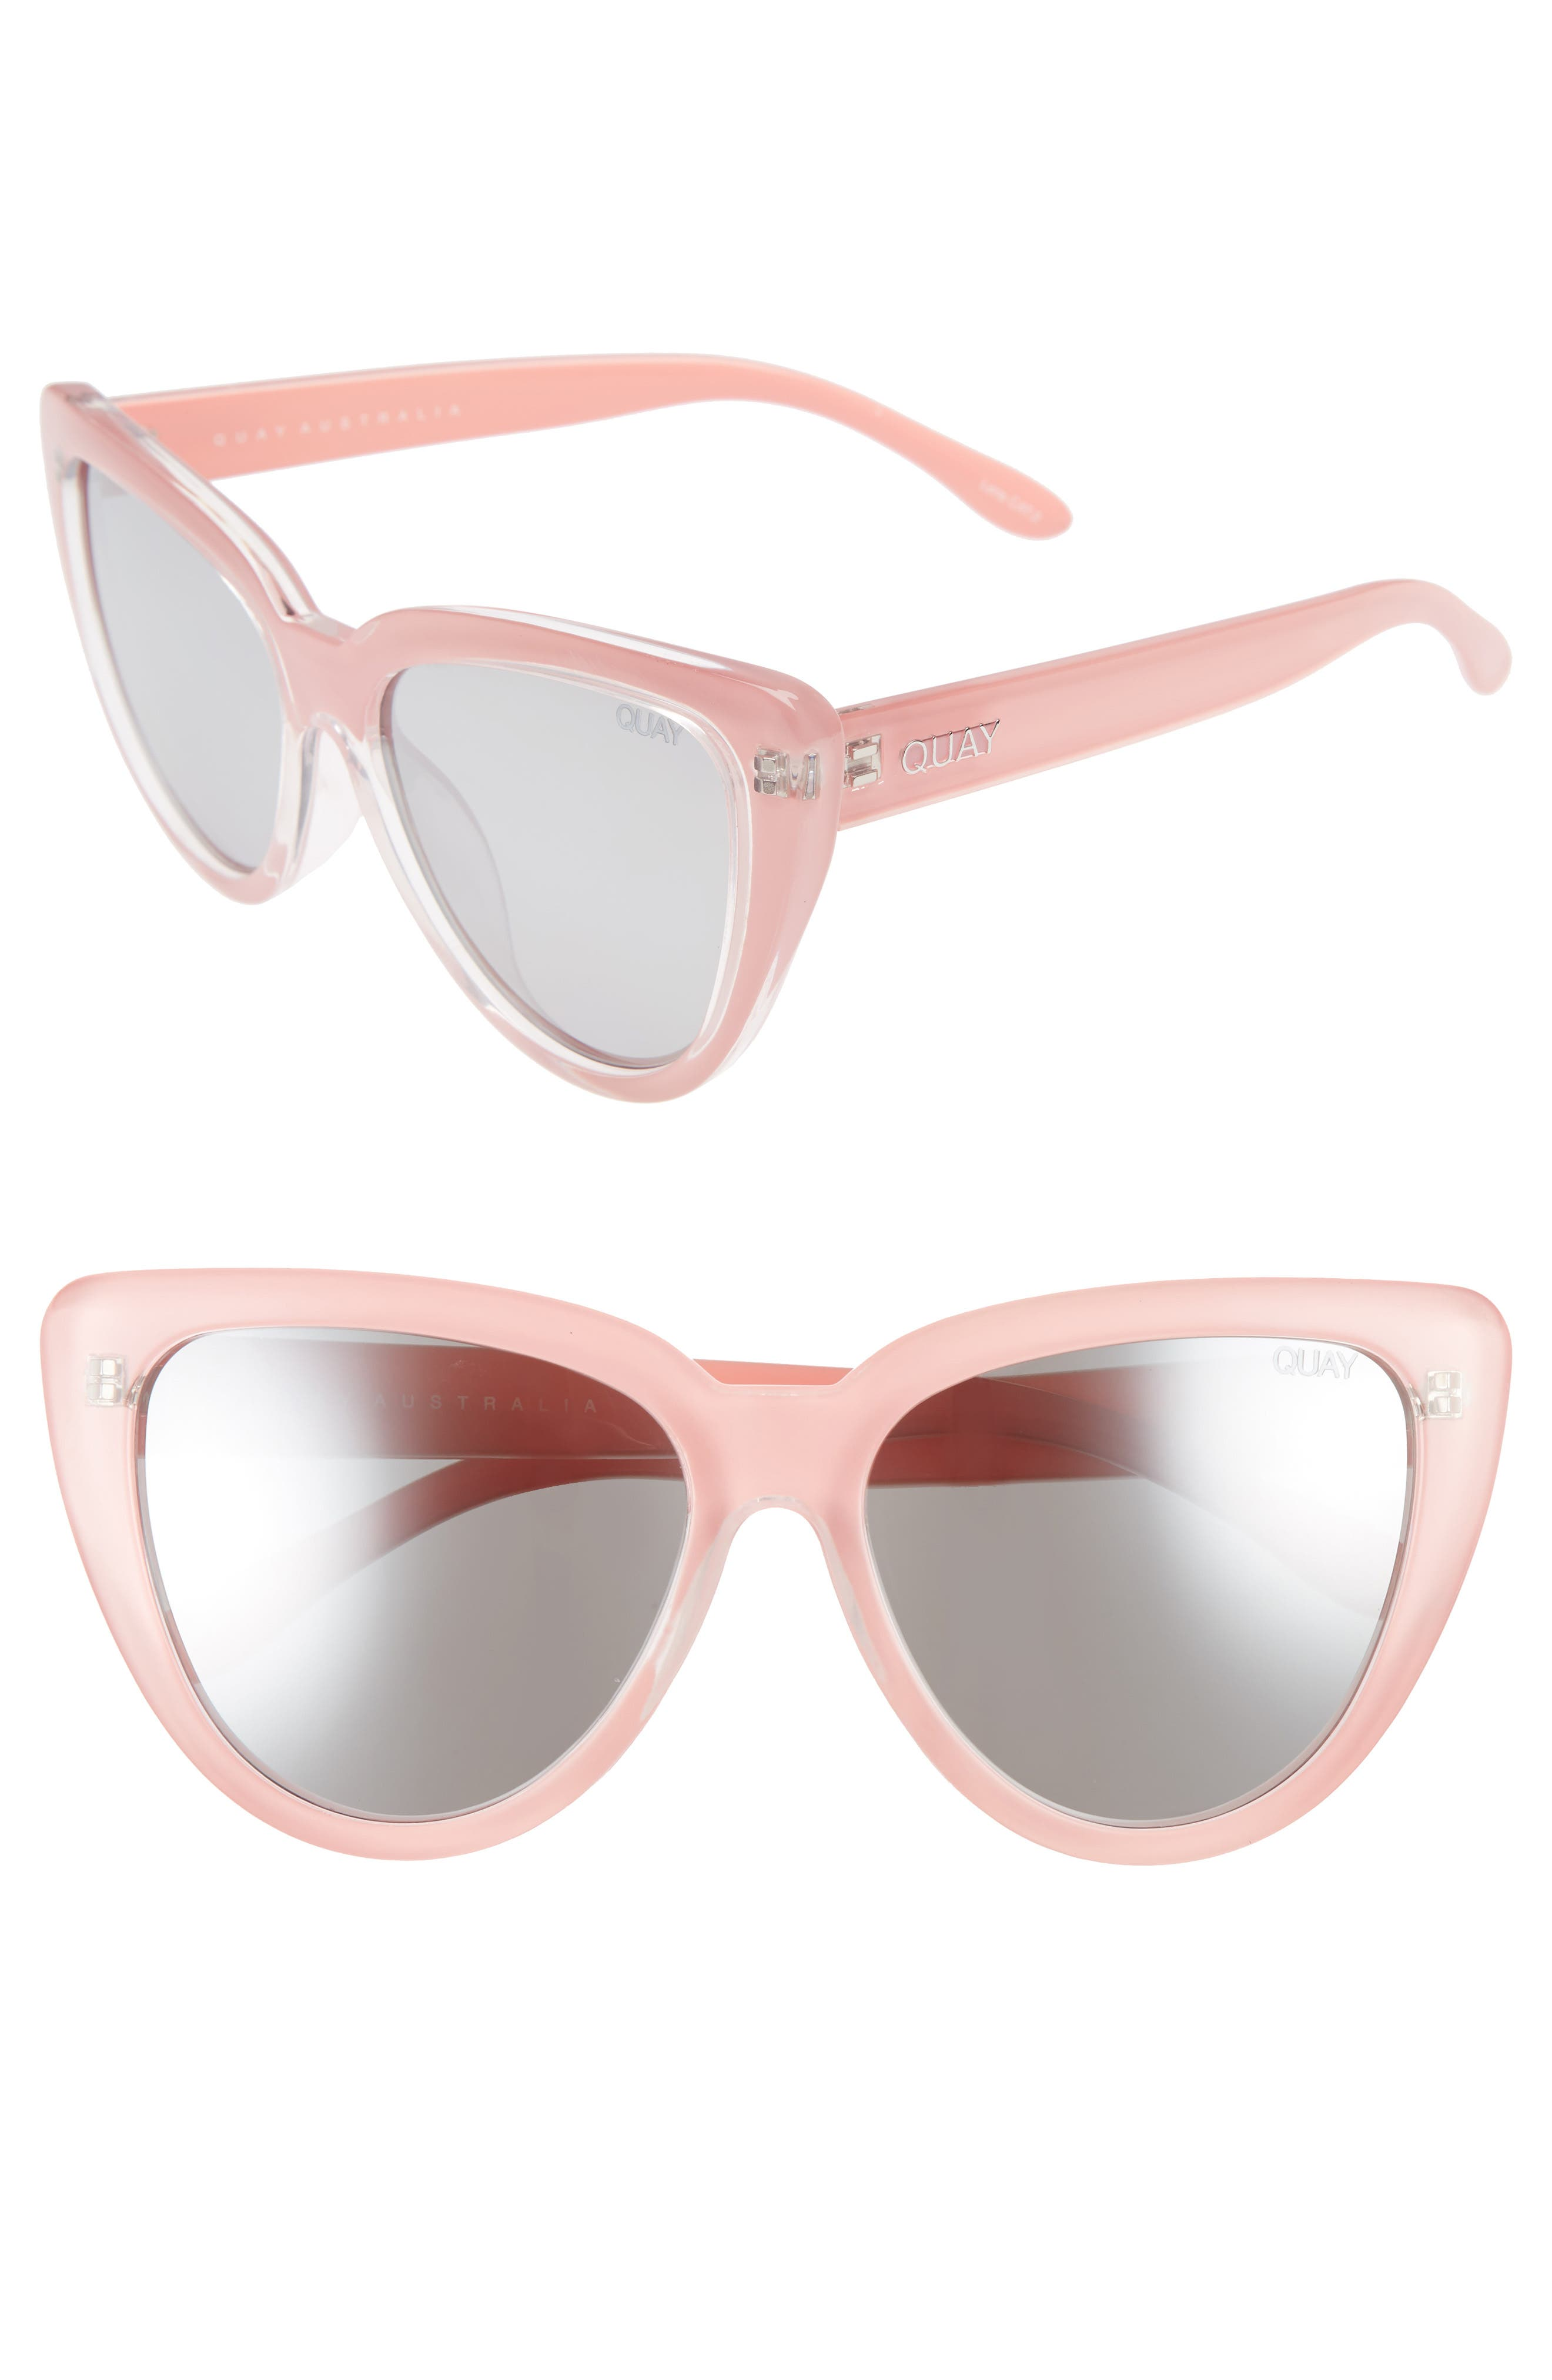 1950s Sunglasses & 50s Glasses   Retro Cat Eye Sunglasses Womens Quay Australia Stray Cat 58Mm Mirrored Cat Eye Sunglasses - $55.00 AT vintagedancer.com